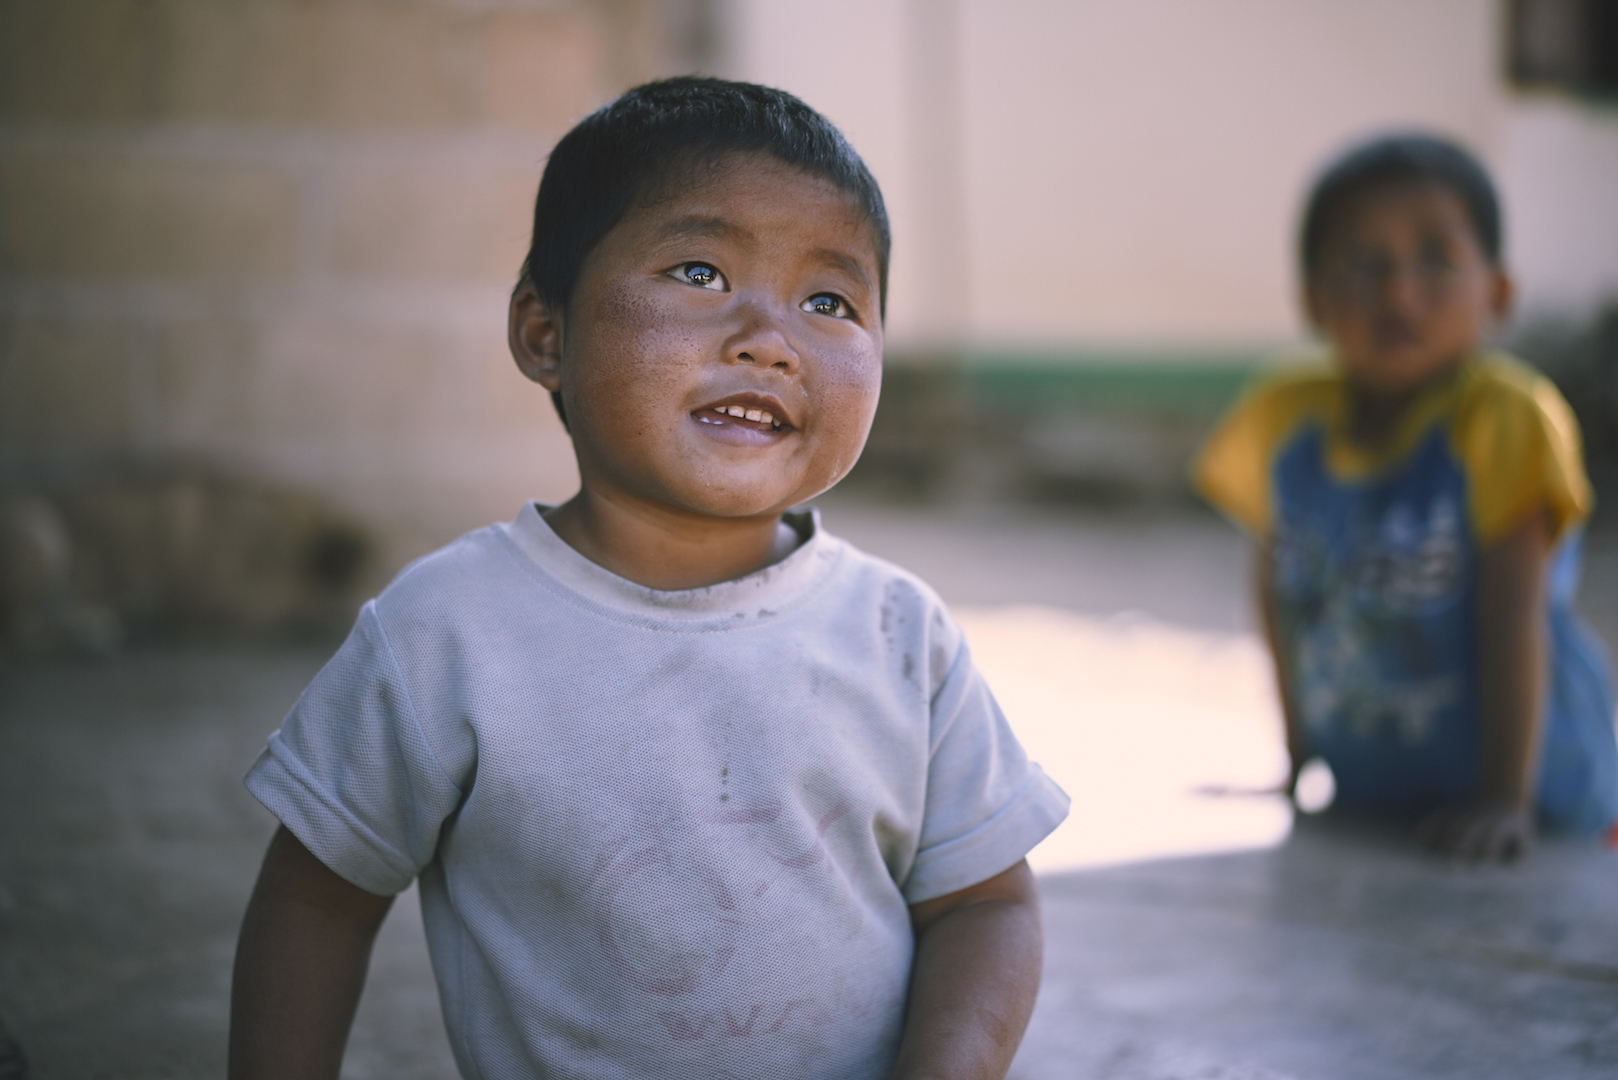 Khasar_S_BoyAndHisFriend_LuangPrabang_Laos_Winter_2014.jpg